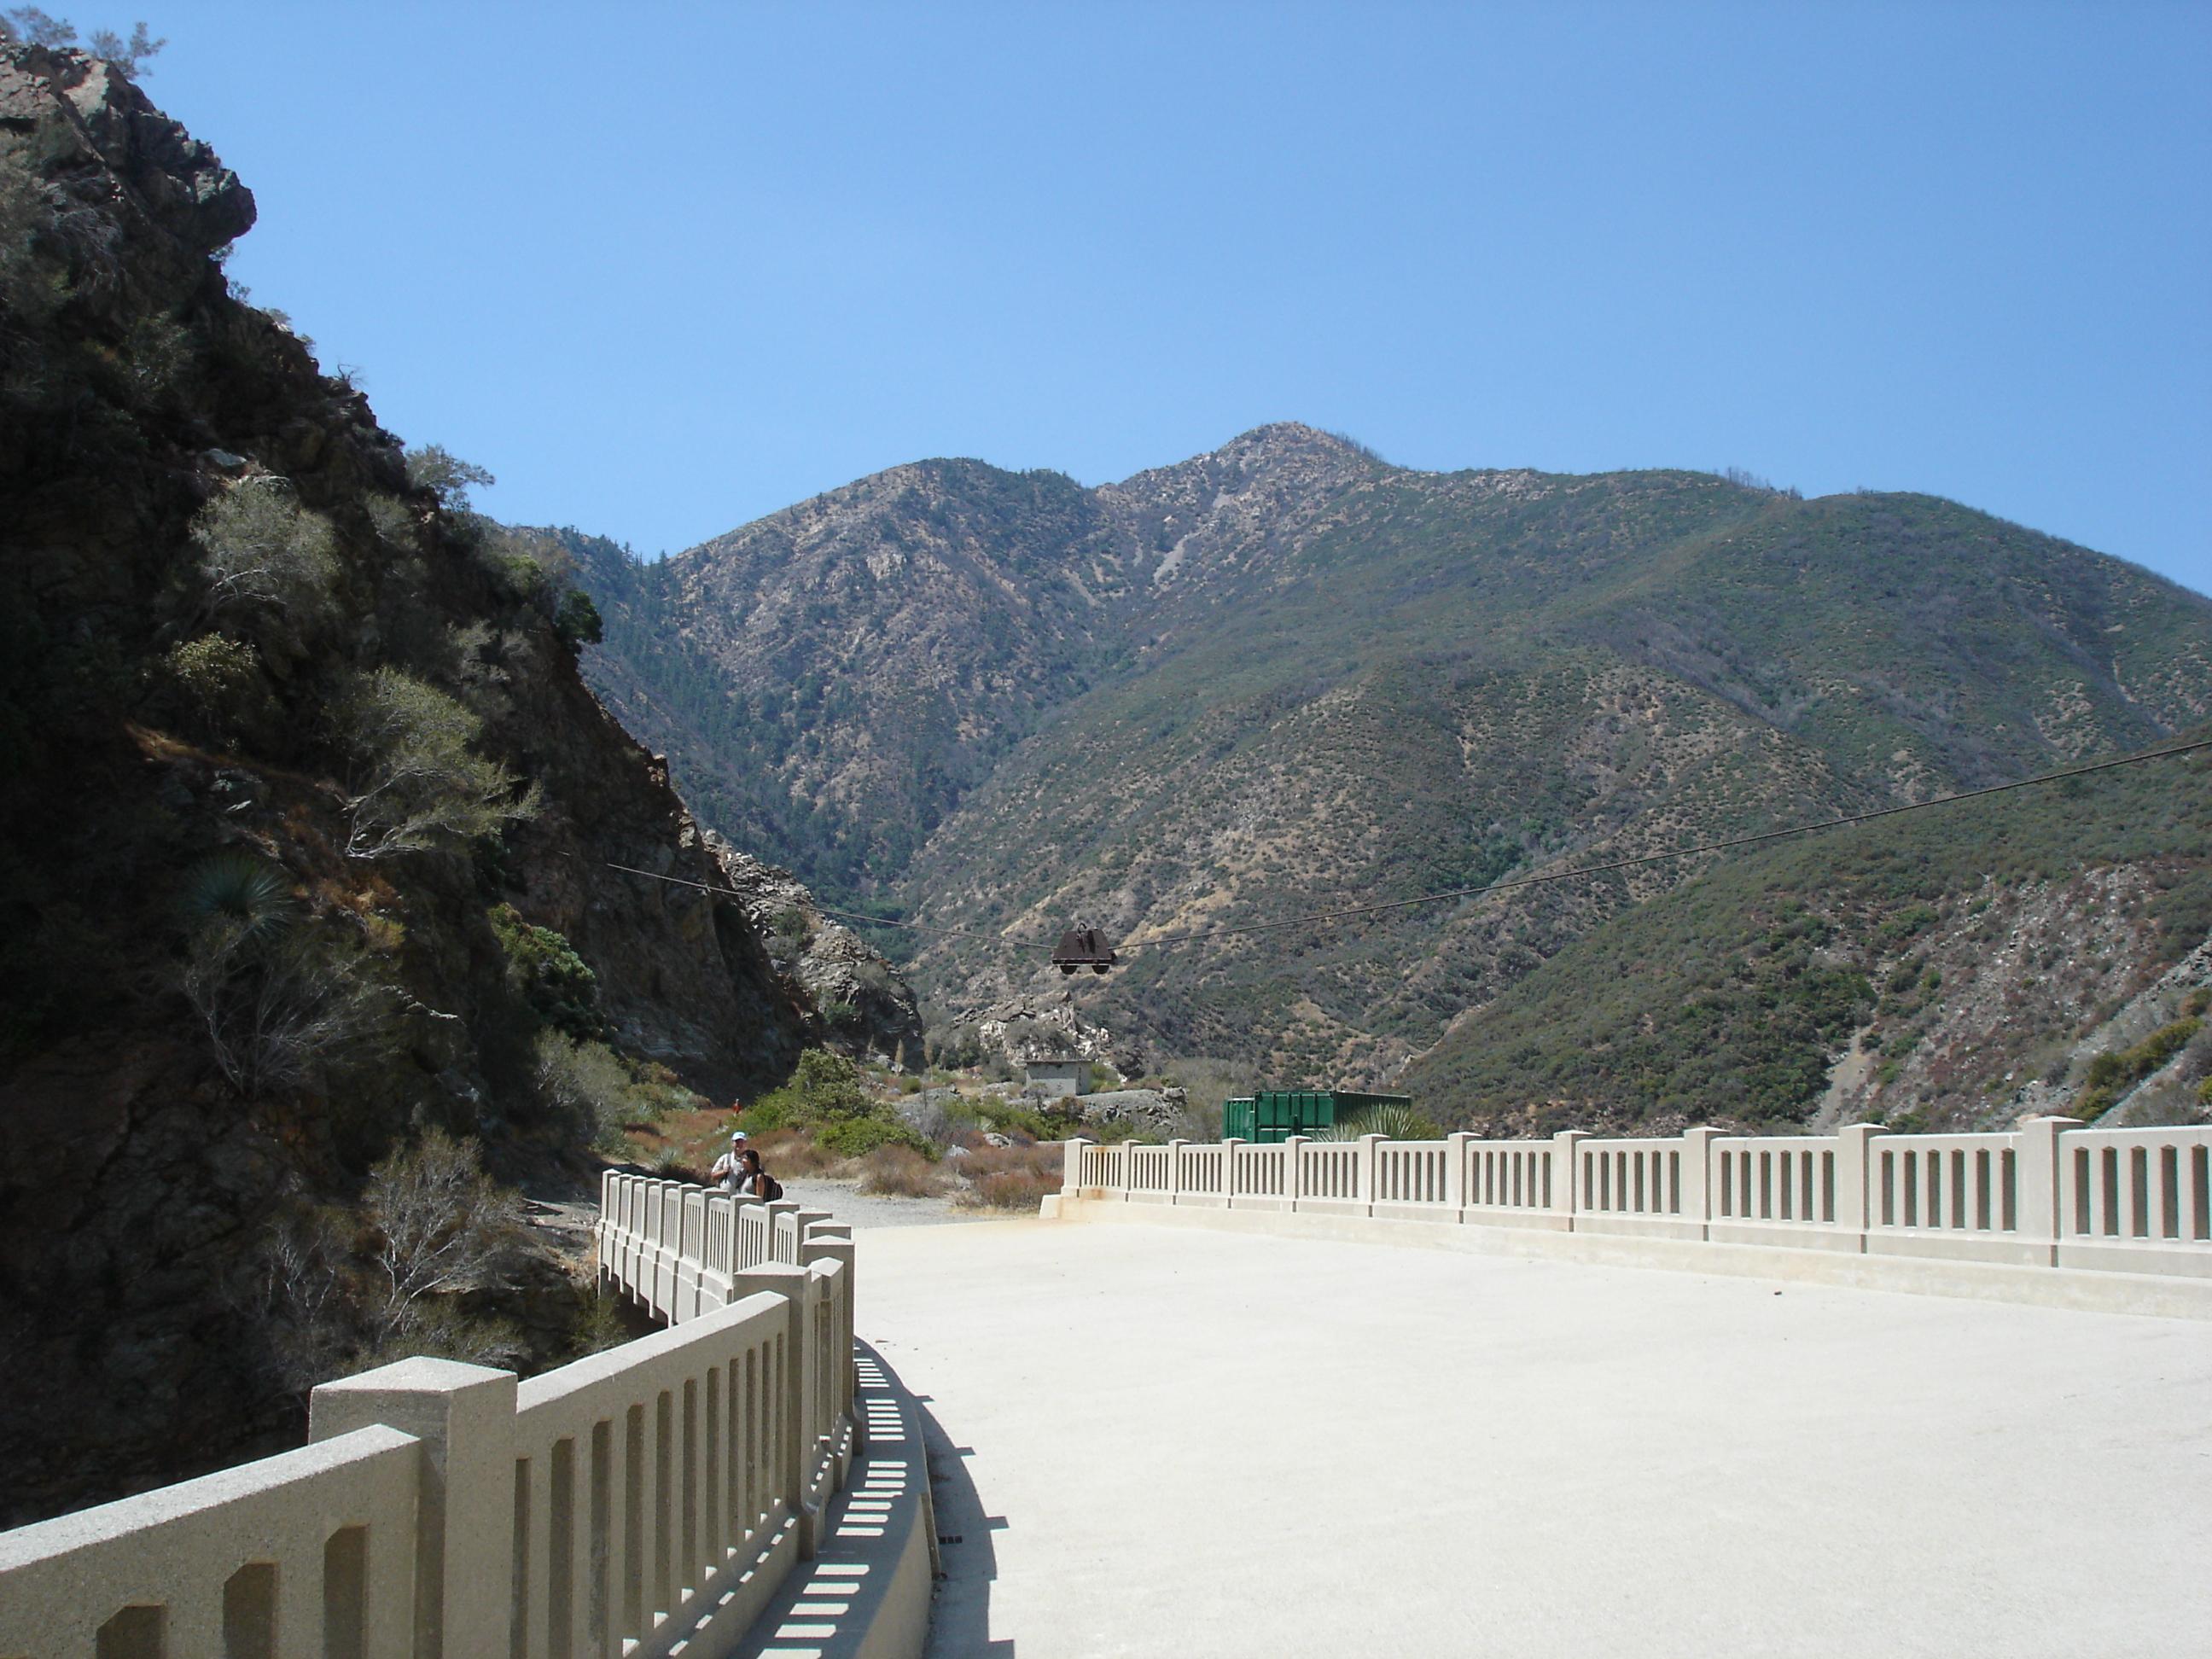 FileBridge to Nowhere San Gabriel Mountains 10.jpg ...